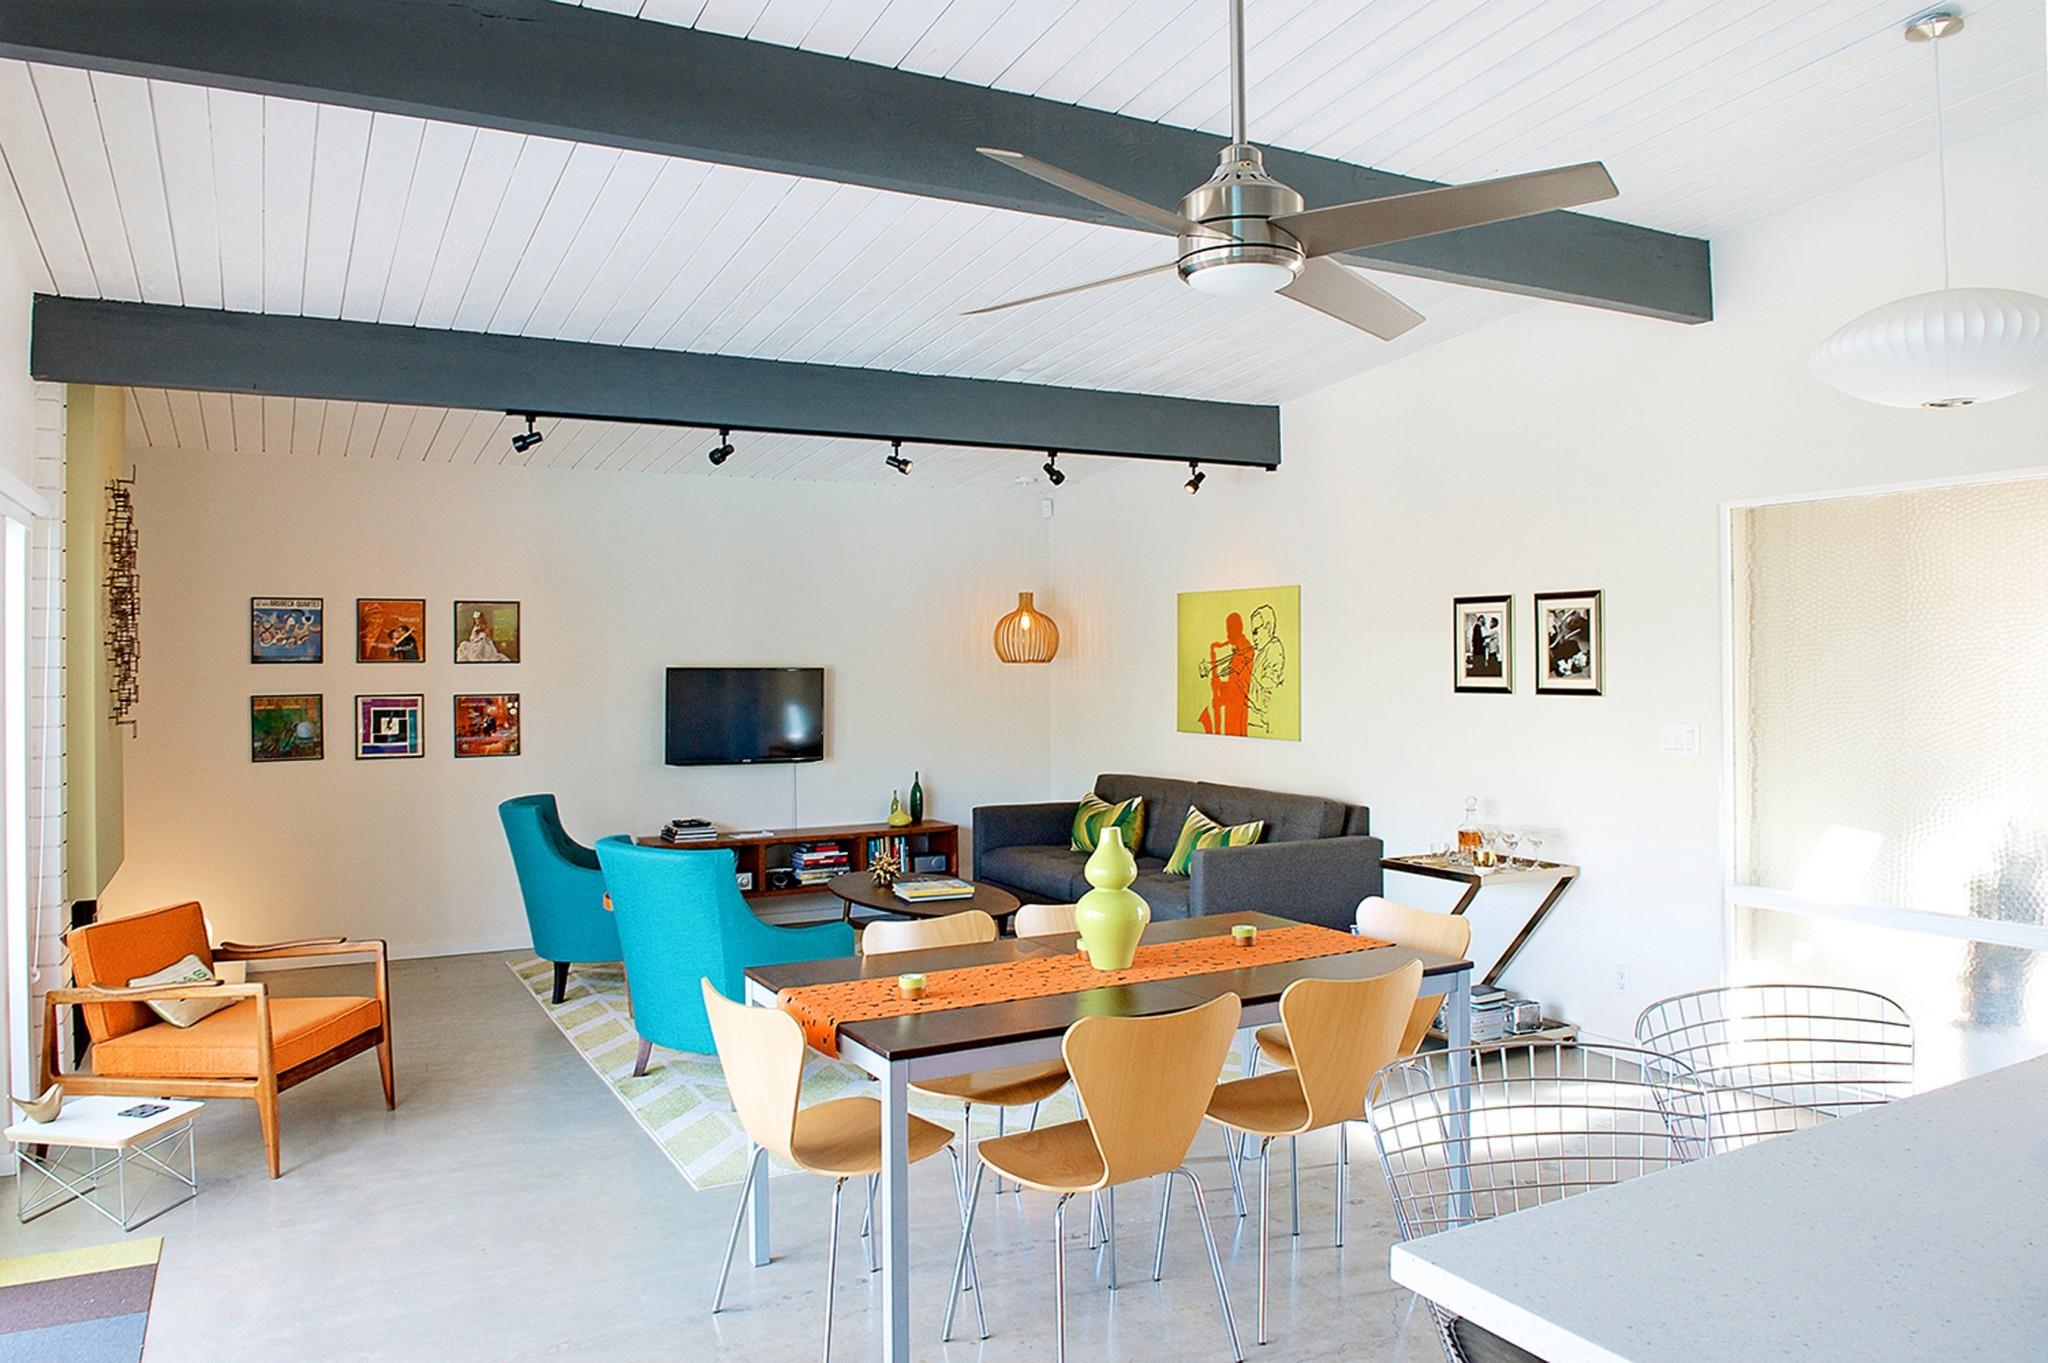 Easmor William Krisel Palm Springs House Tour Dining Room